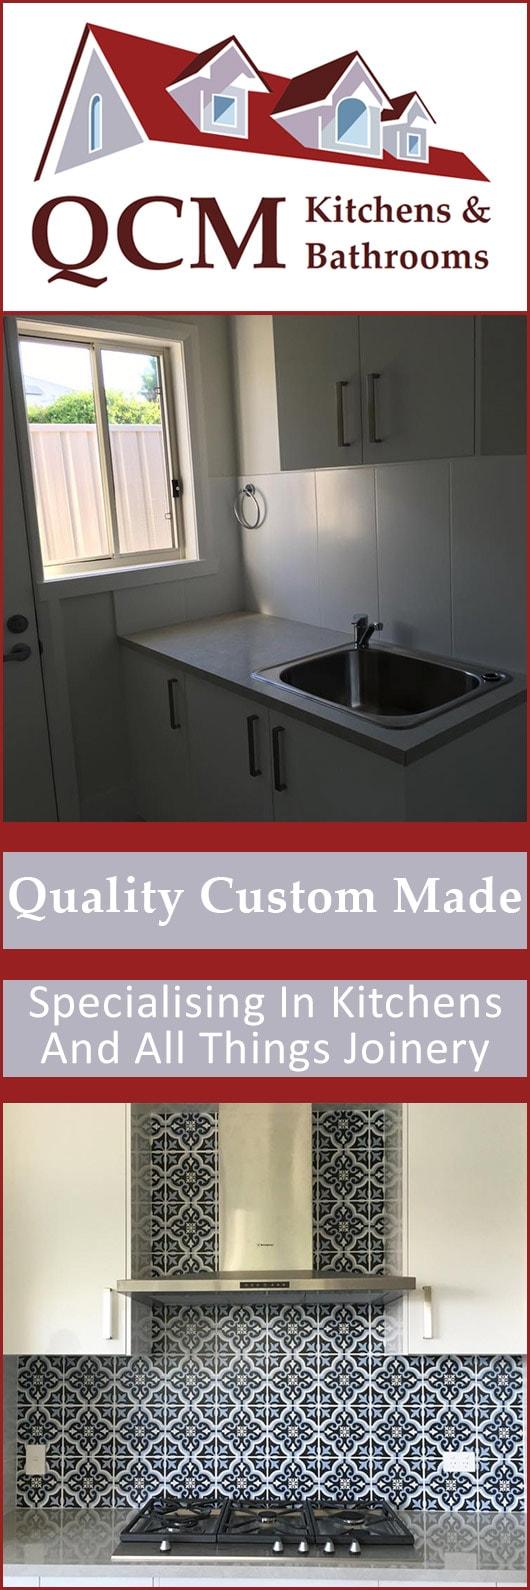 qcm kitchens and bathrooms kitchen renovations designs unit 8